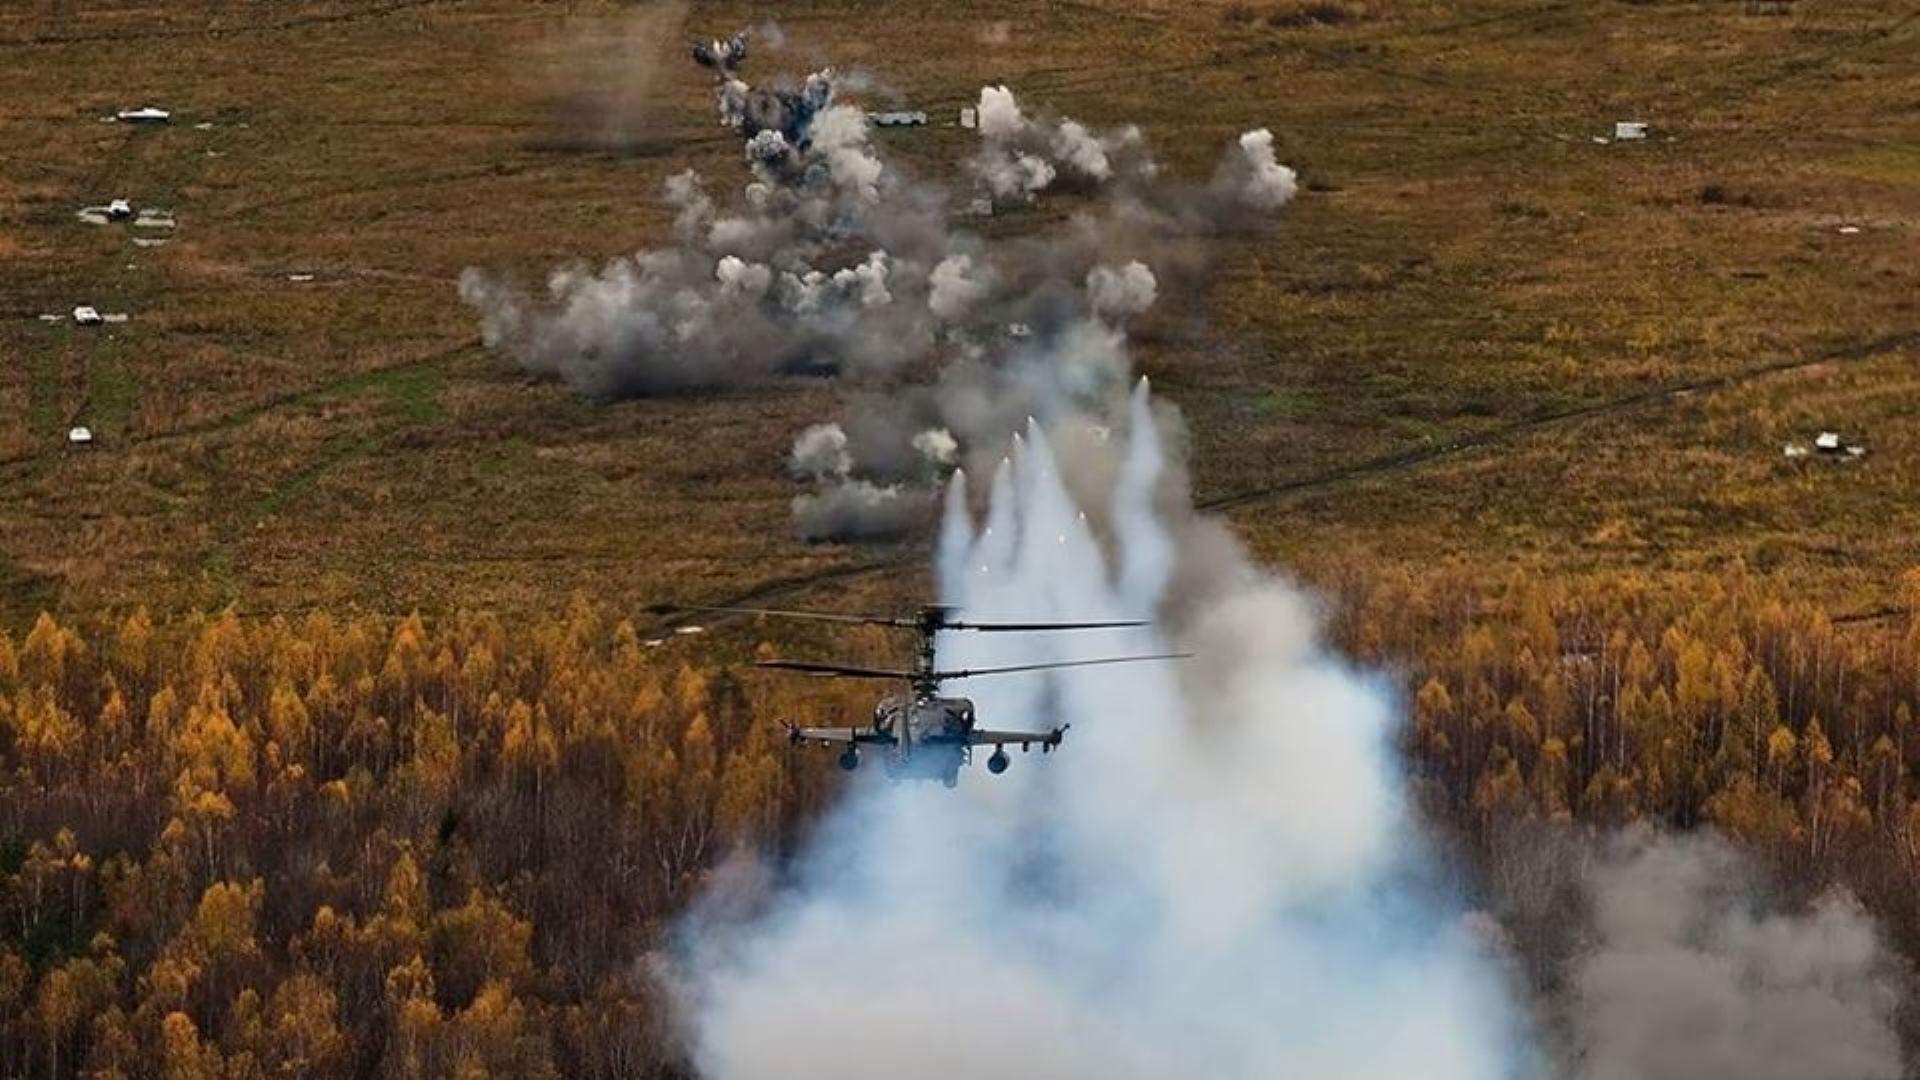 RFAF Ka-52 'alligator' firing rockets...